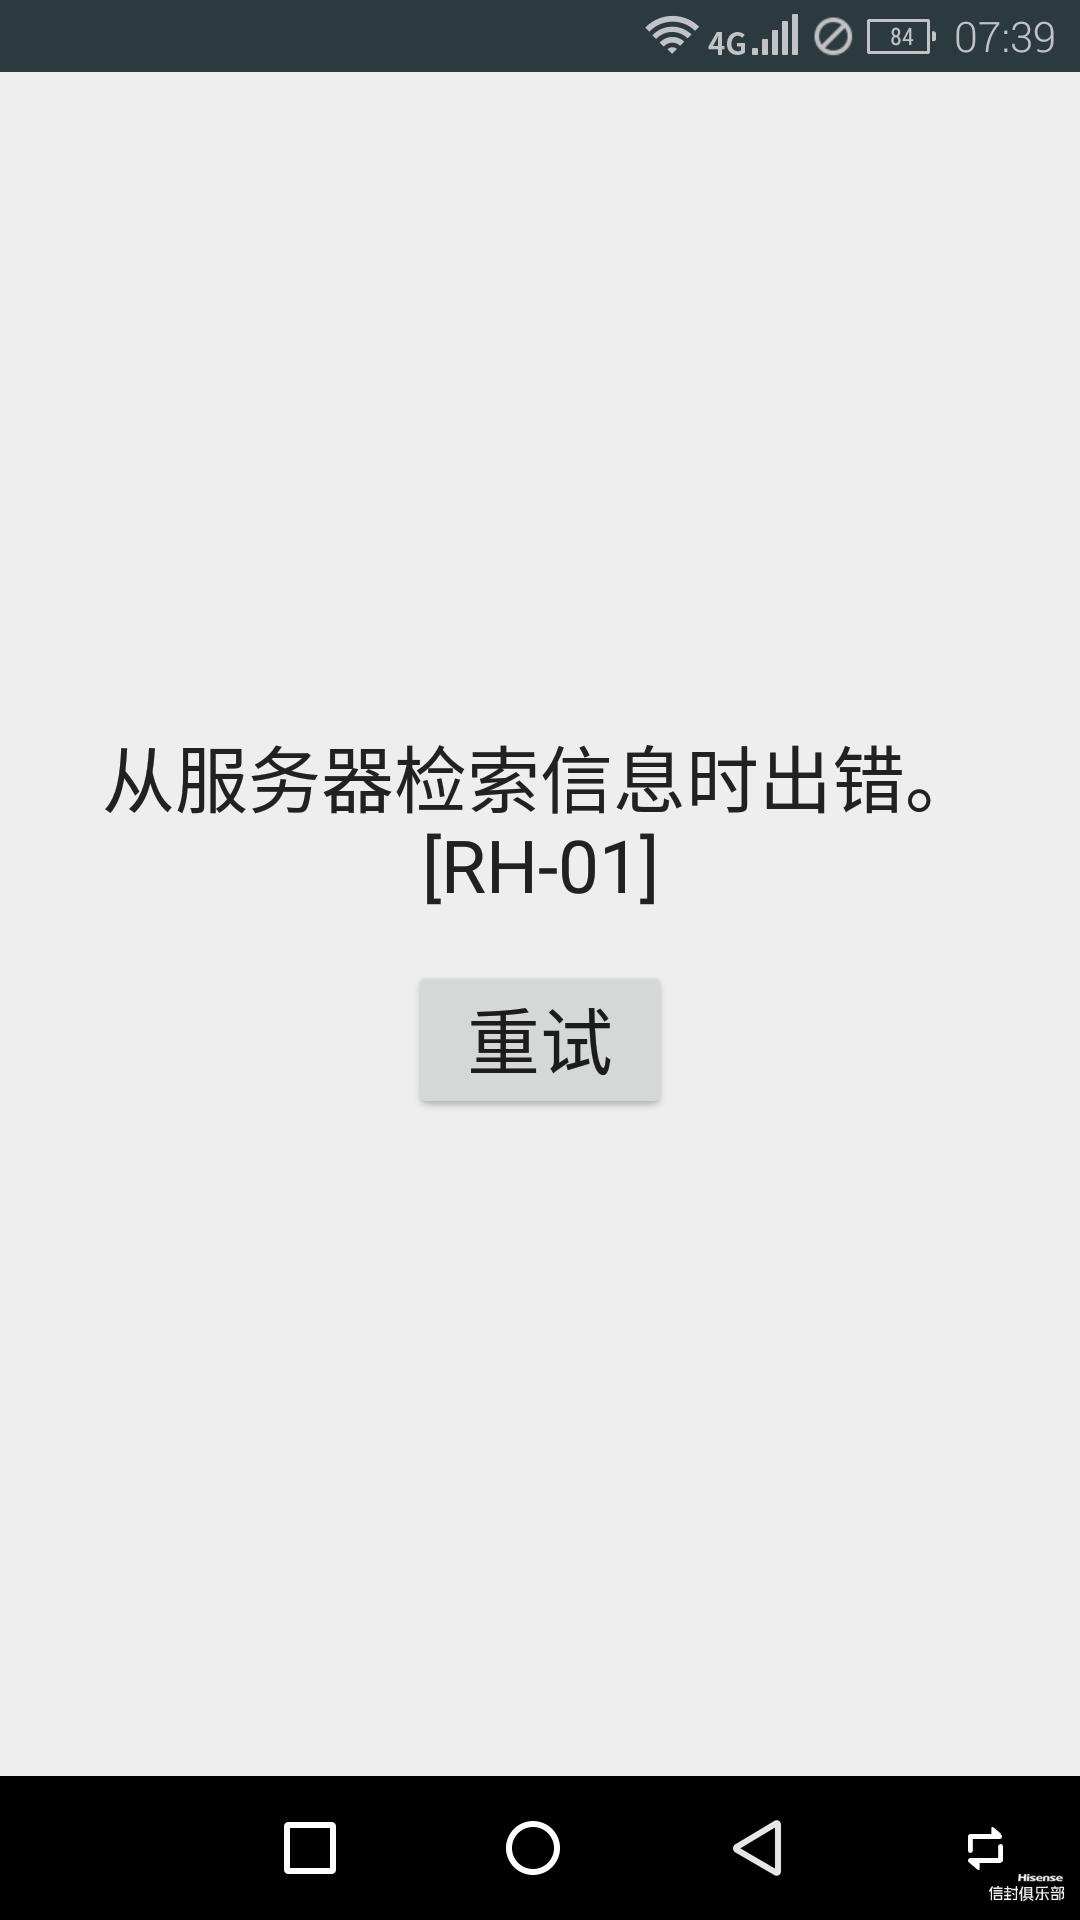 Screenshot_20170703-073900_Google Play 商店.png